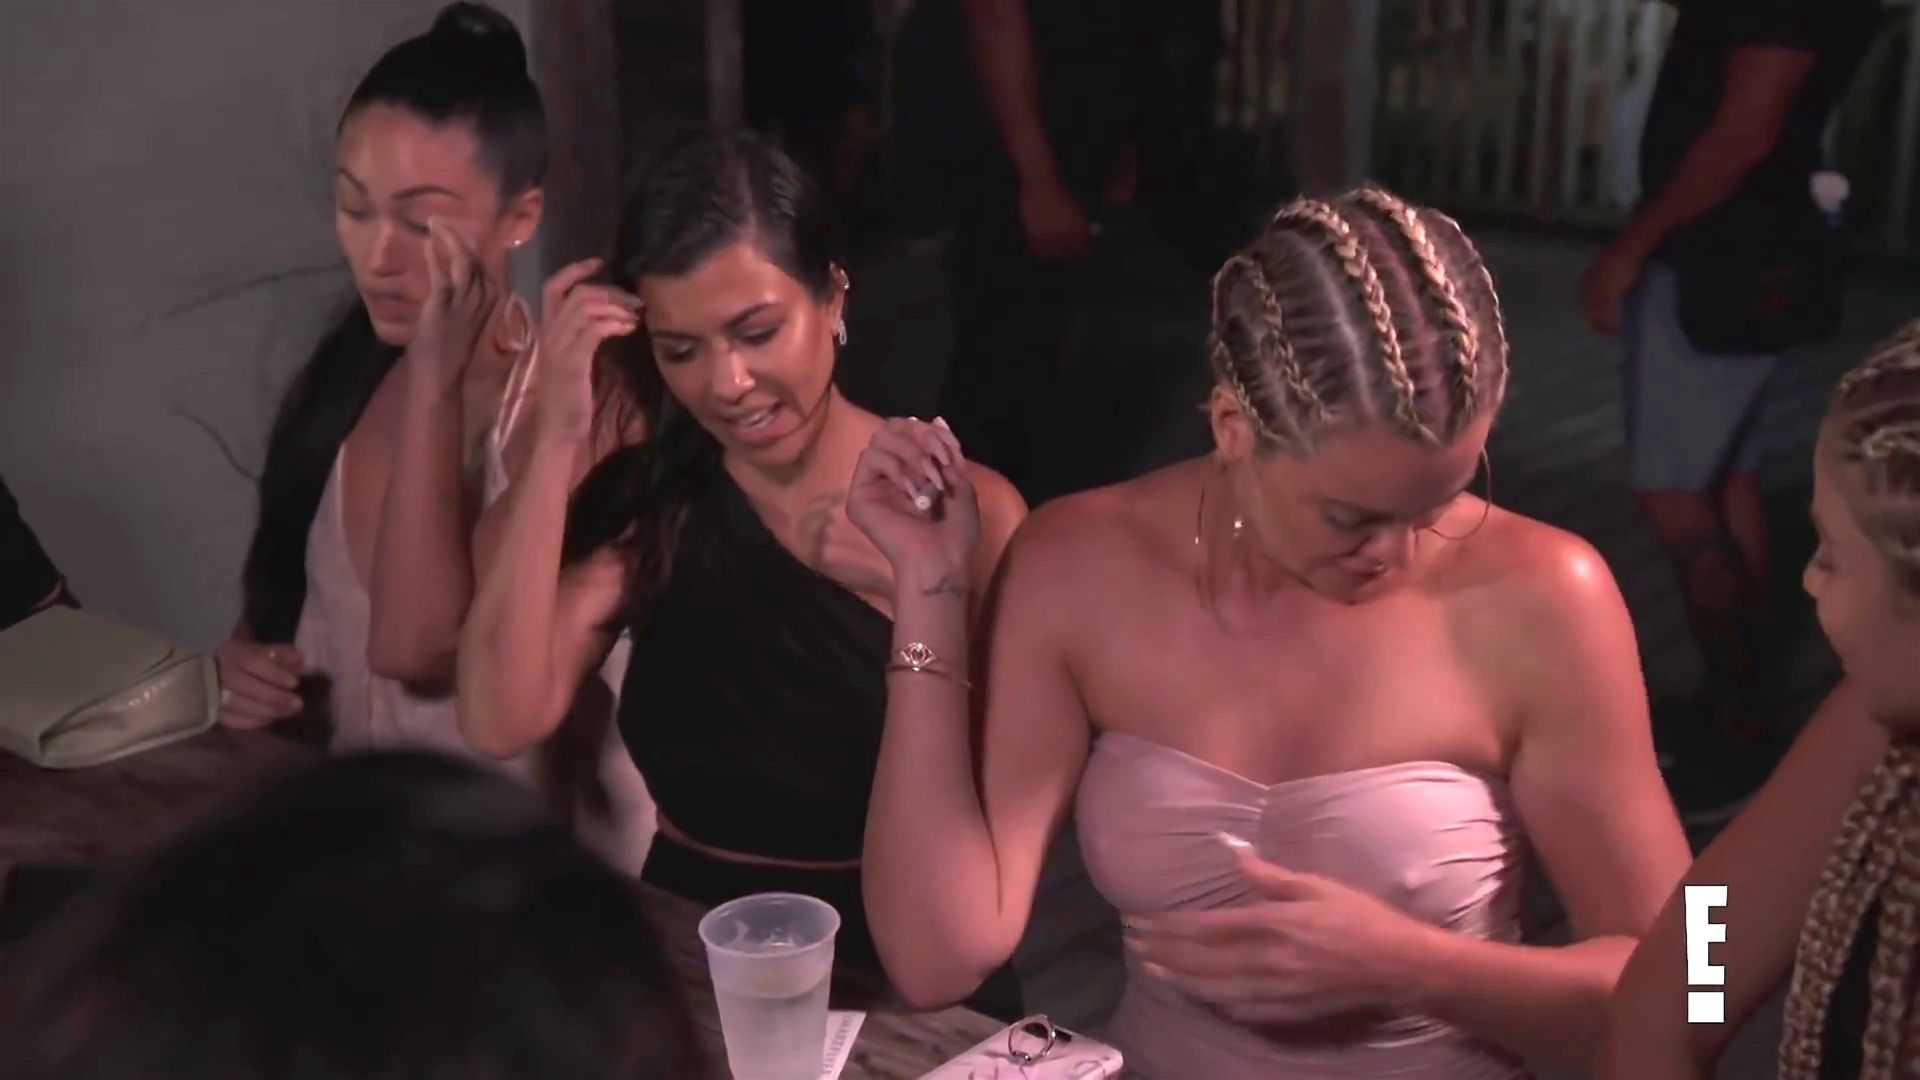 Khloé Kardashian Gets A Little Cold Without A Bra 0014